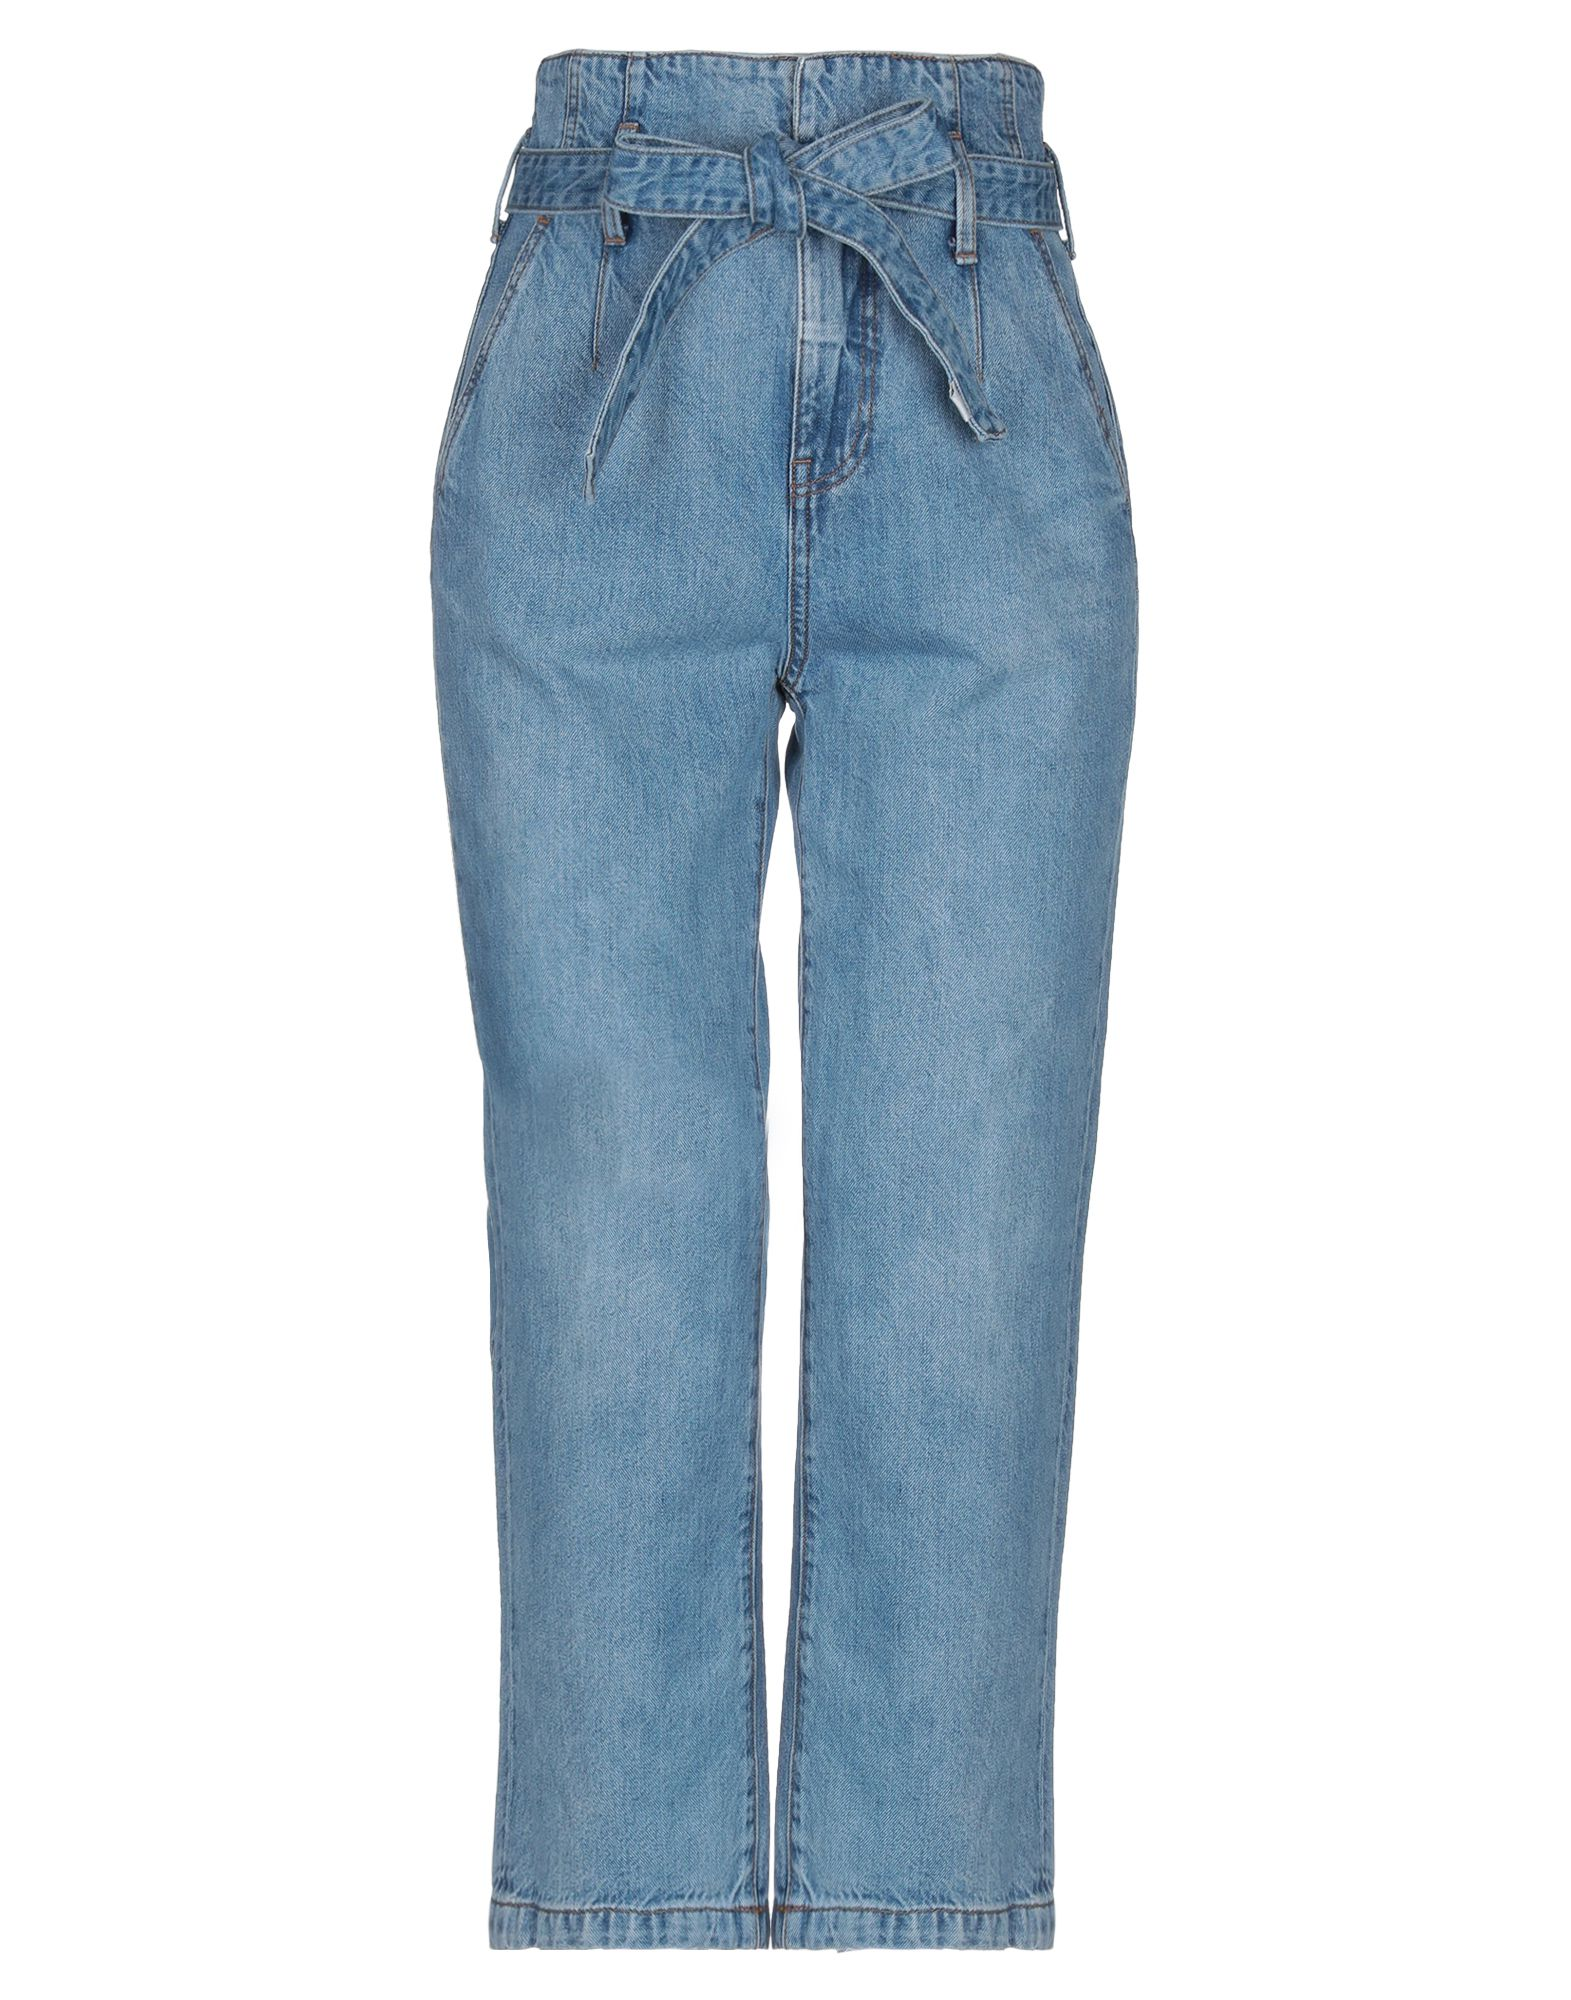 MISS SIXTY Джинсовые брюки ремень miss sixty